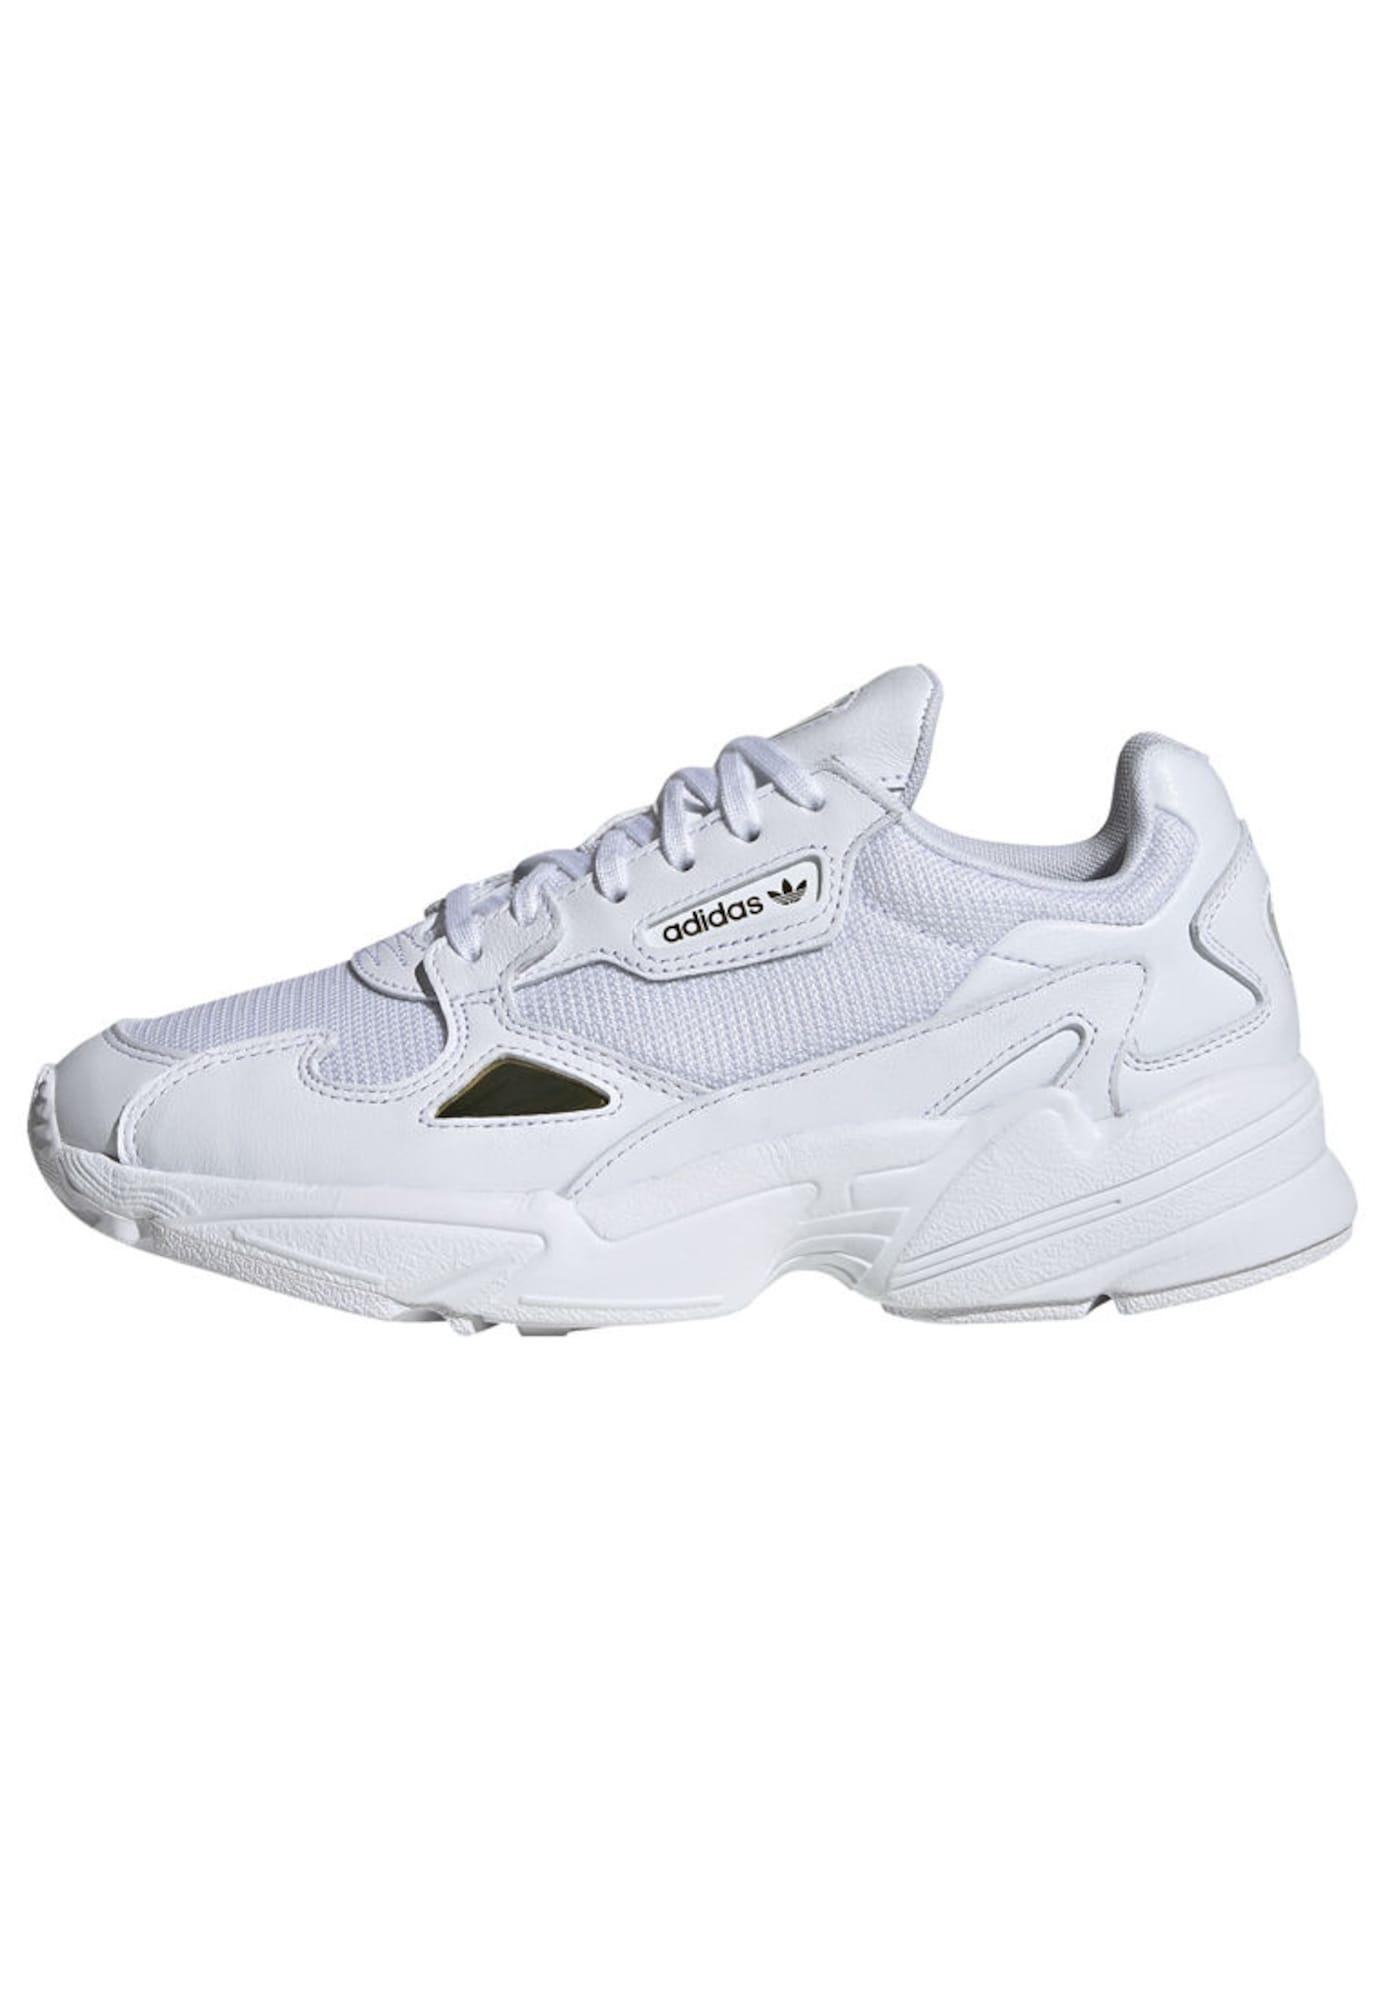 ADIDAS ORIGINALS, Dames Sneakers laag 'Falcon', goud / wit